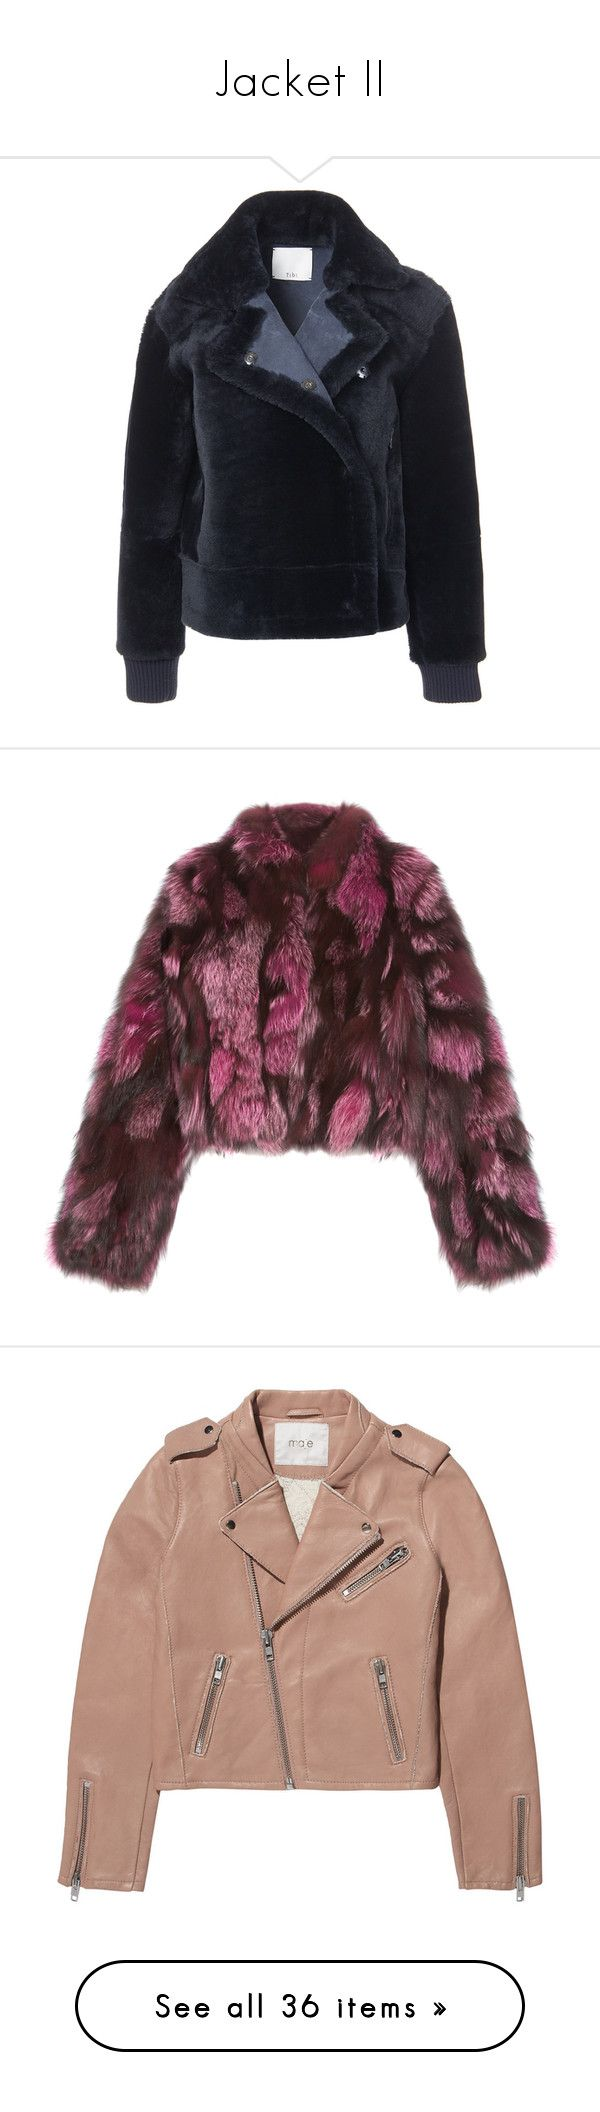 """Jacket II"" by feelin-q ❤ liked on Polyvore featuring outerwear, jackets, midnight navy, aviator jackets, shearling aviator jacket, navy jacket, blue jackets, tibi, coats and coats & jackets"